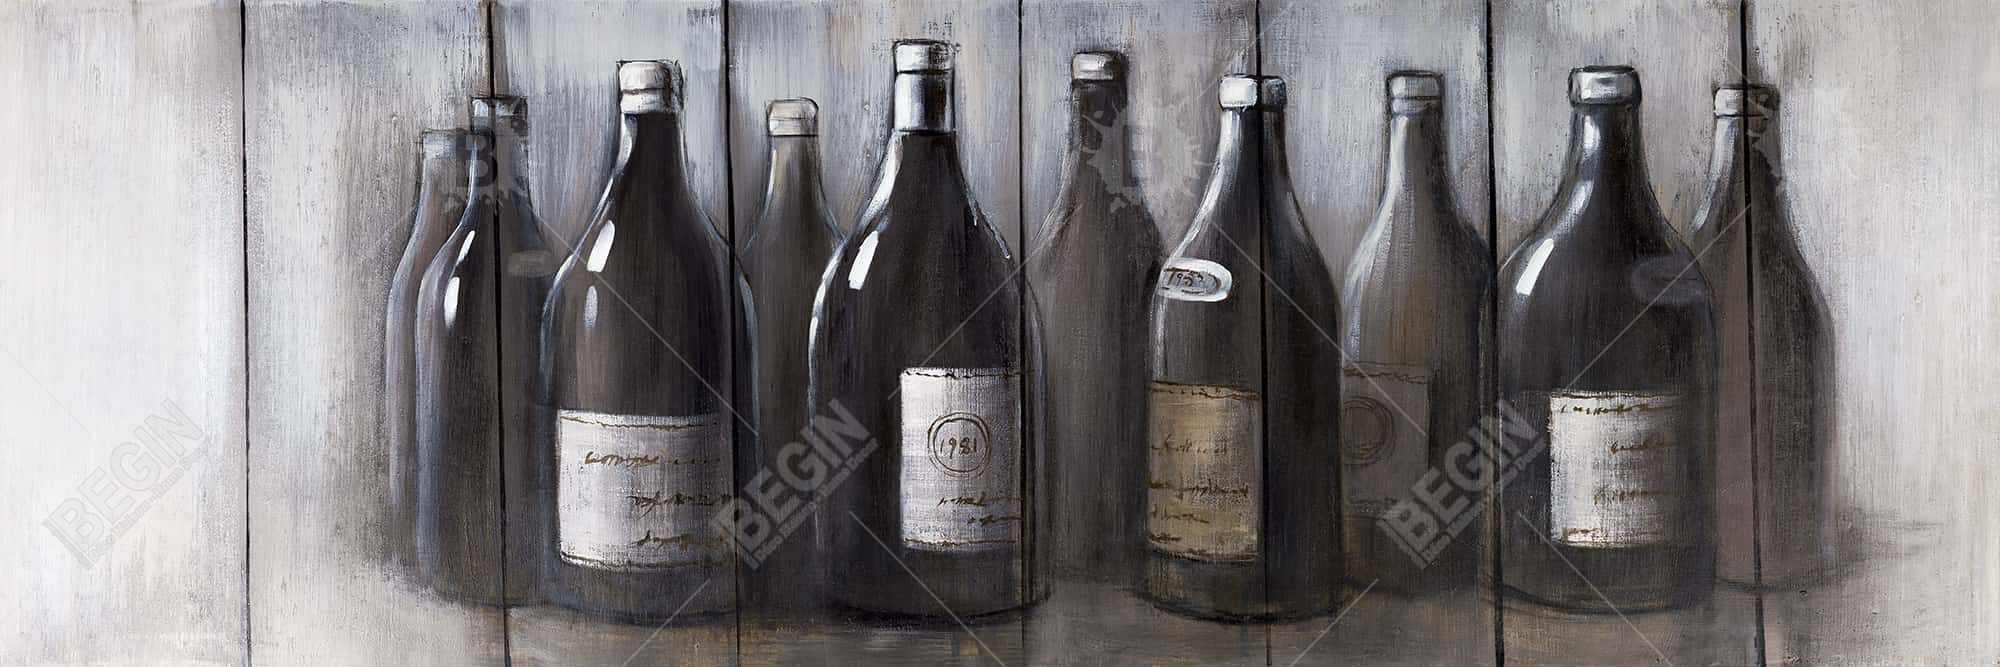 Bottles of wine with wood finish